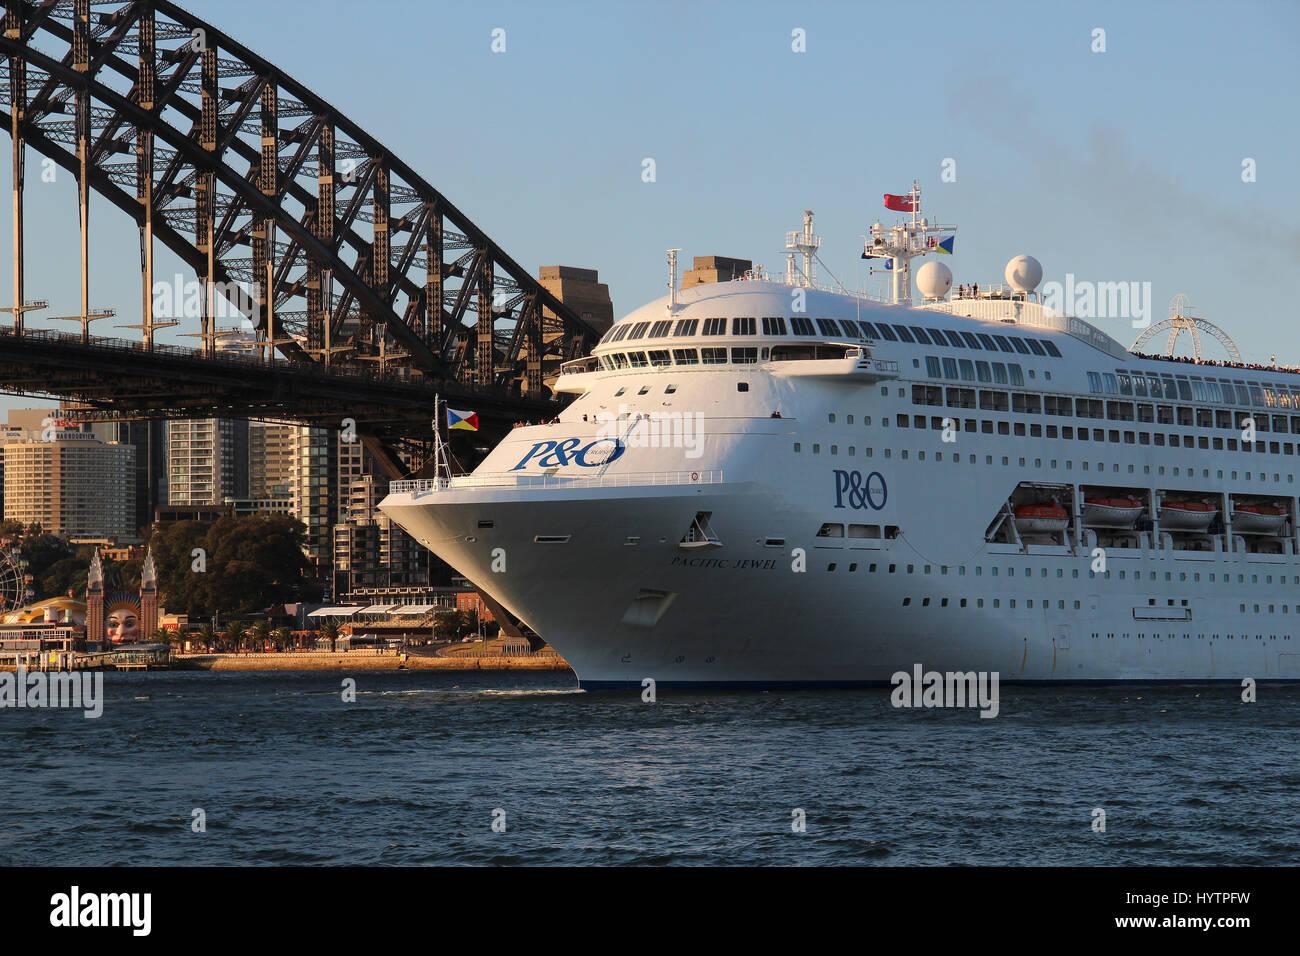 P&O Pacific Jewel cruise arriving with Sydney Harbour Bridge background, Australia - Stock Image